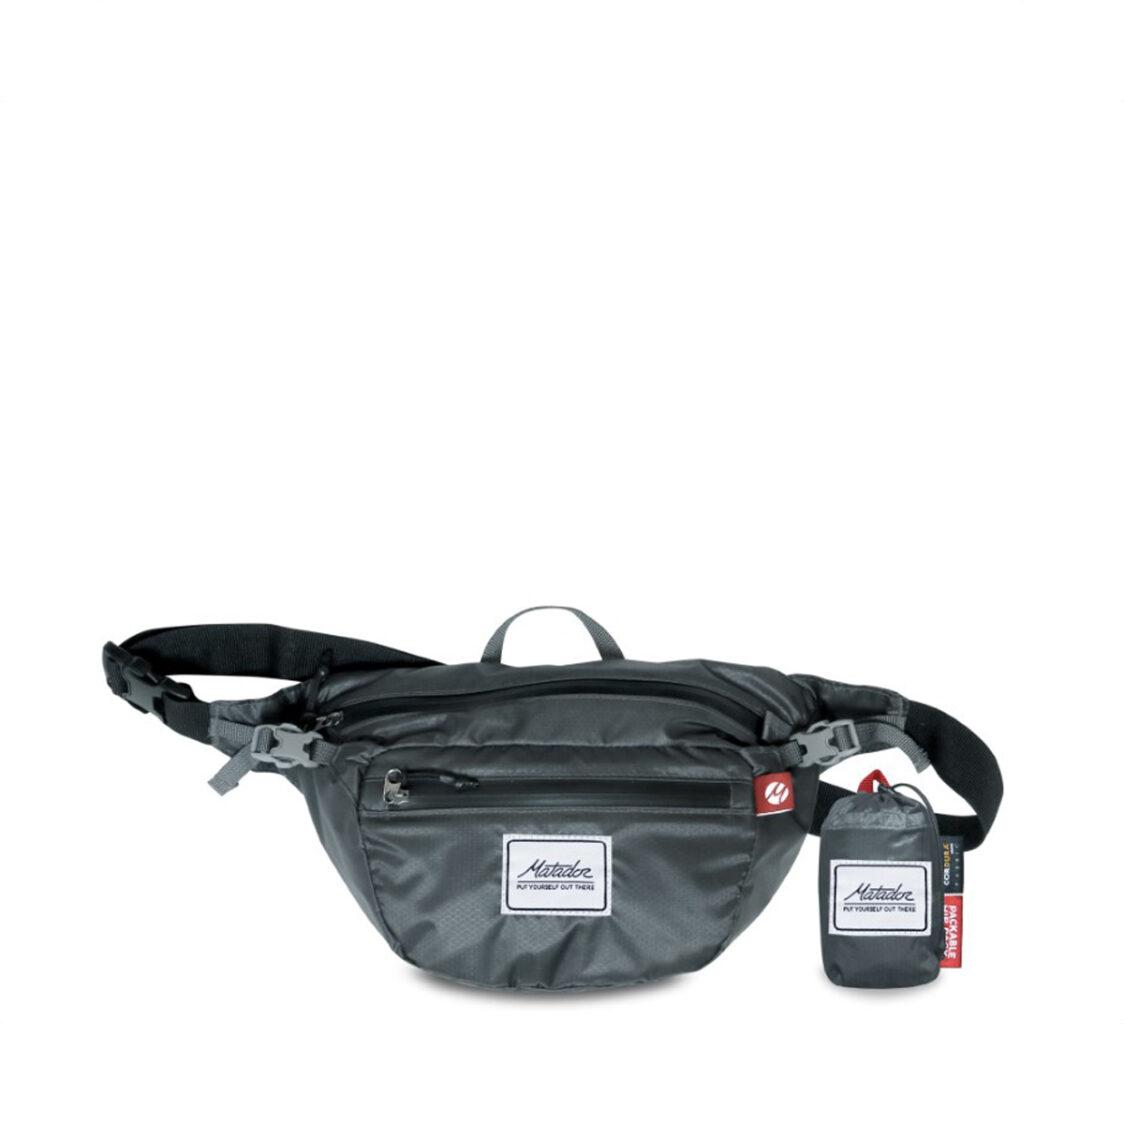 Matador On-Grid Hip Pack Charcoal MA-MATOGHP01BK